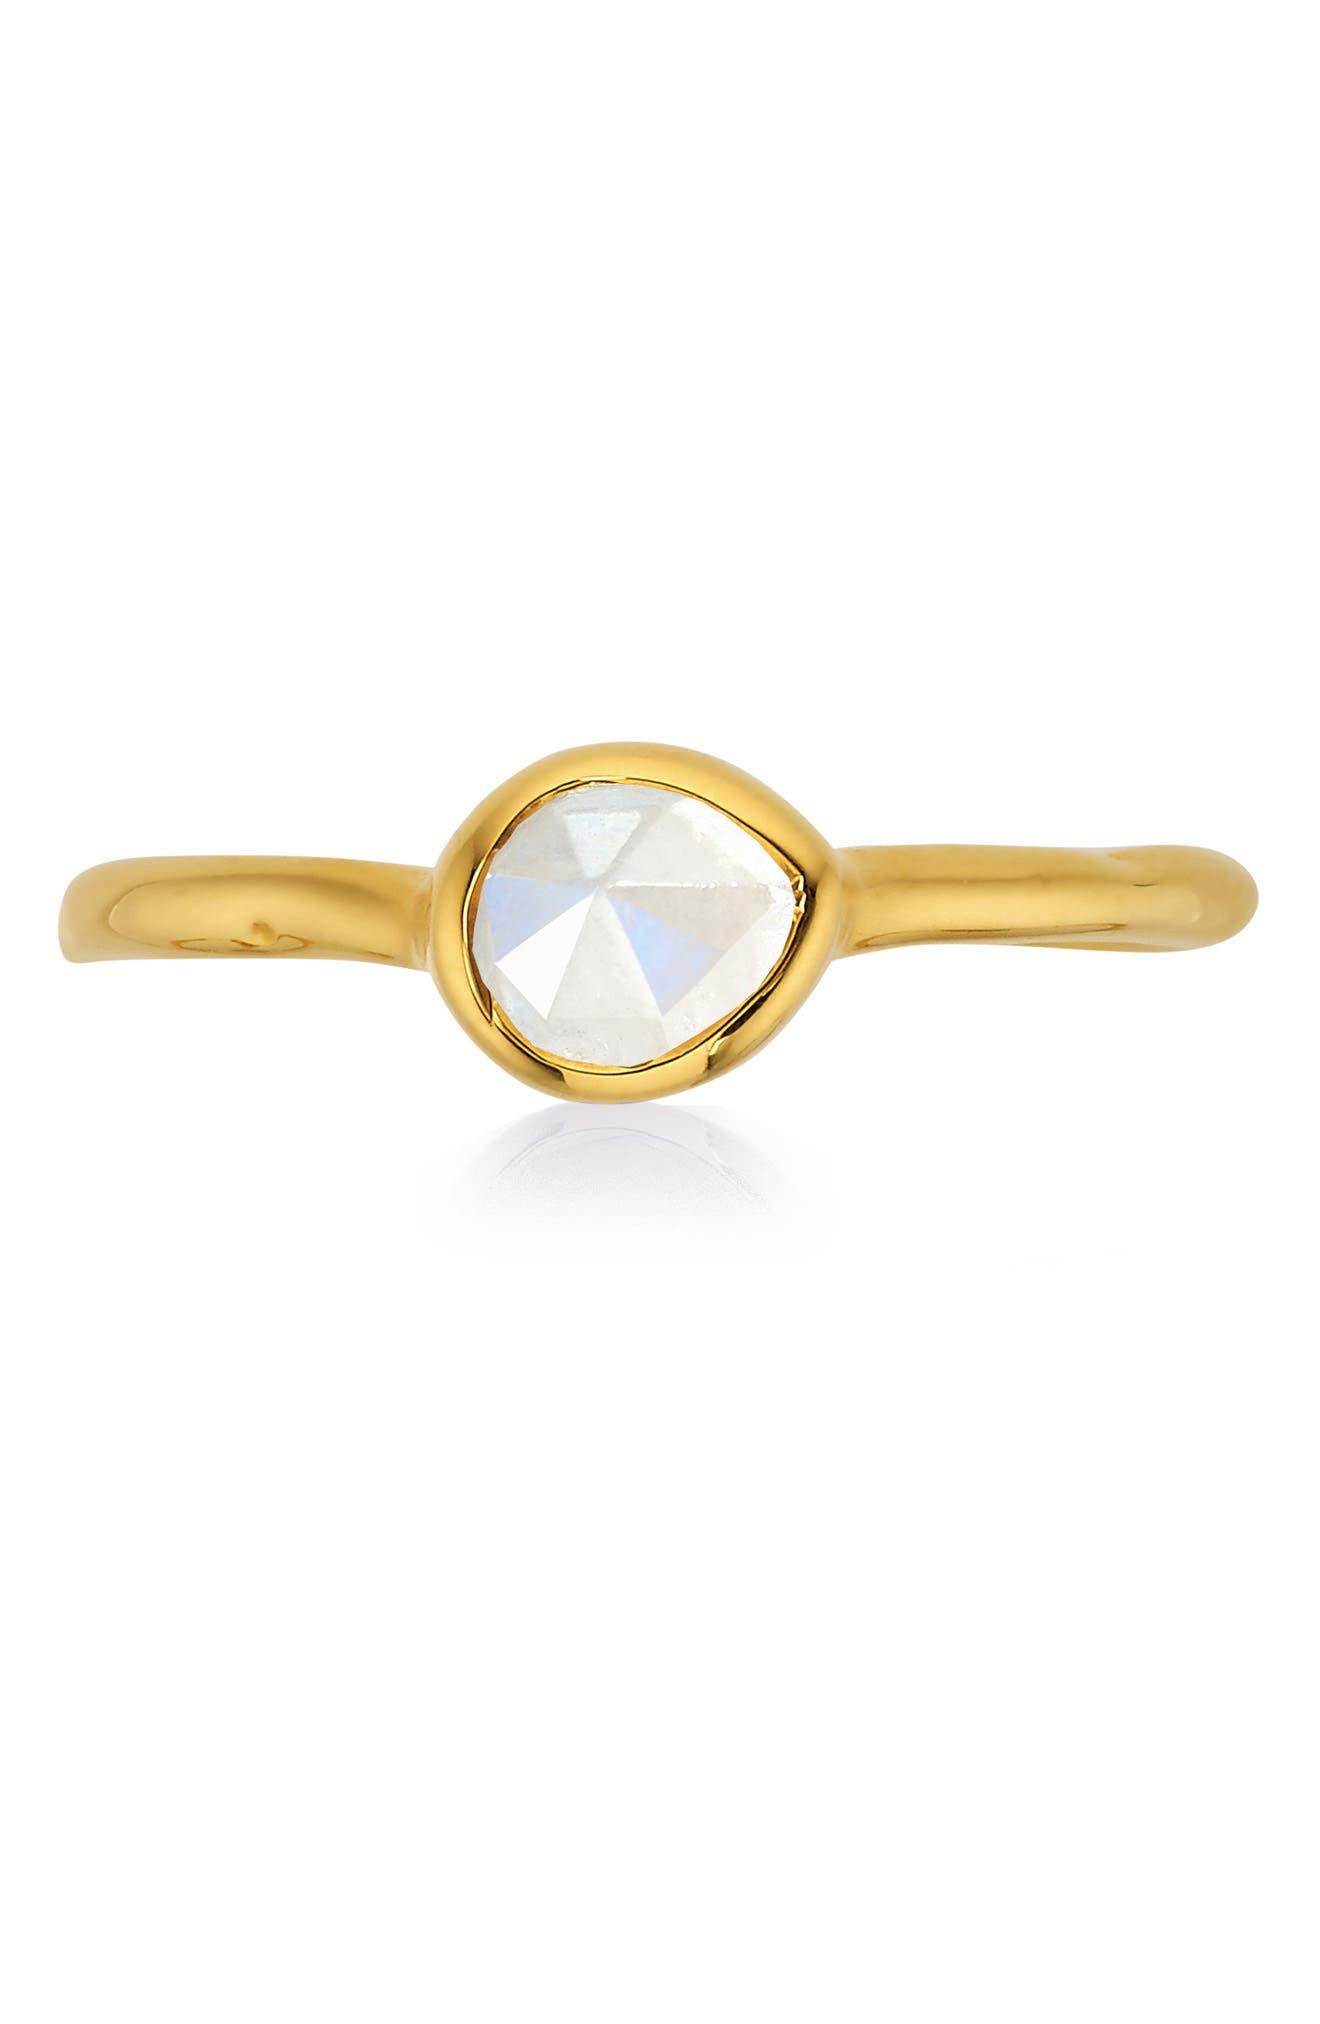 Siren Small Semiprecious Stone Stacking Ring,                             Alternate thumbnail 4, color,                             GOLD/ MOONSTONE